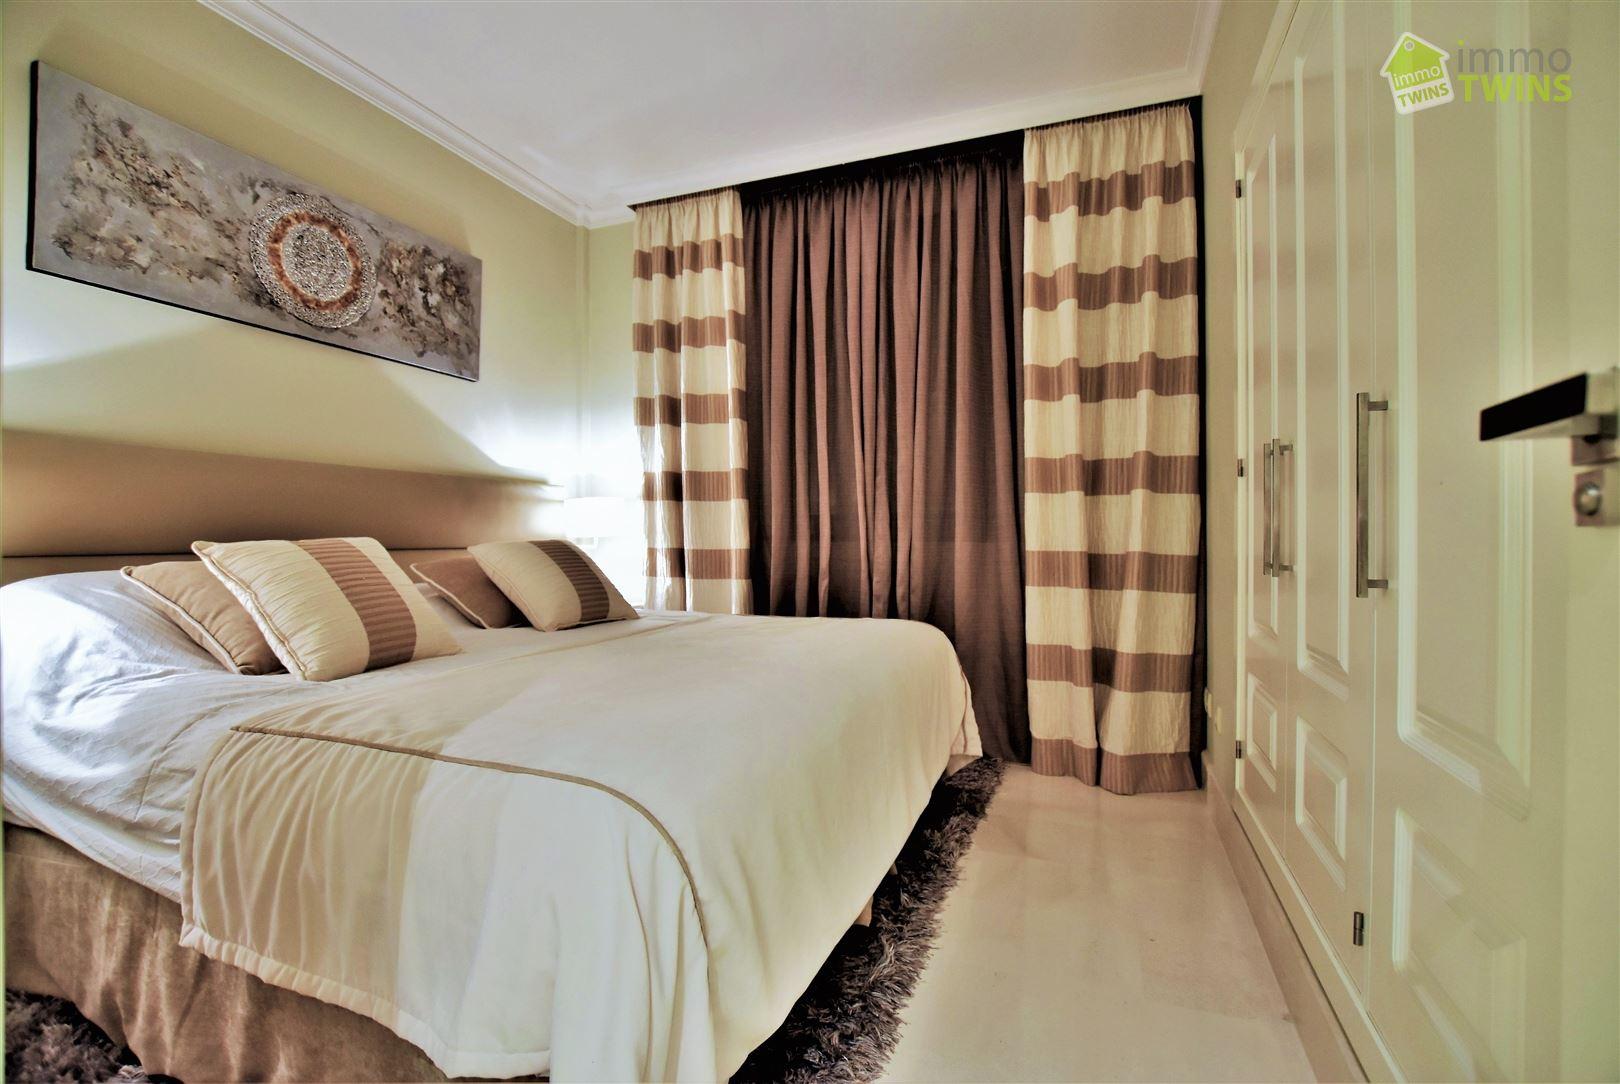 Foto 23 : Appartement te 29679 MARBELLA (Spanje) - Prijs € 485.000